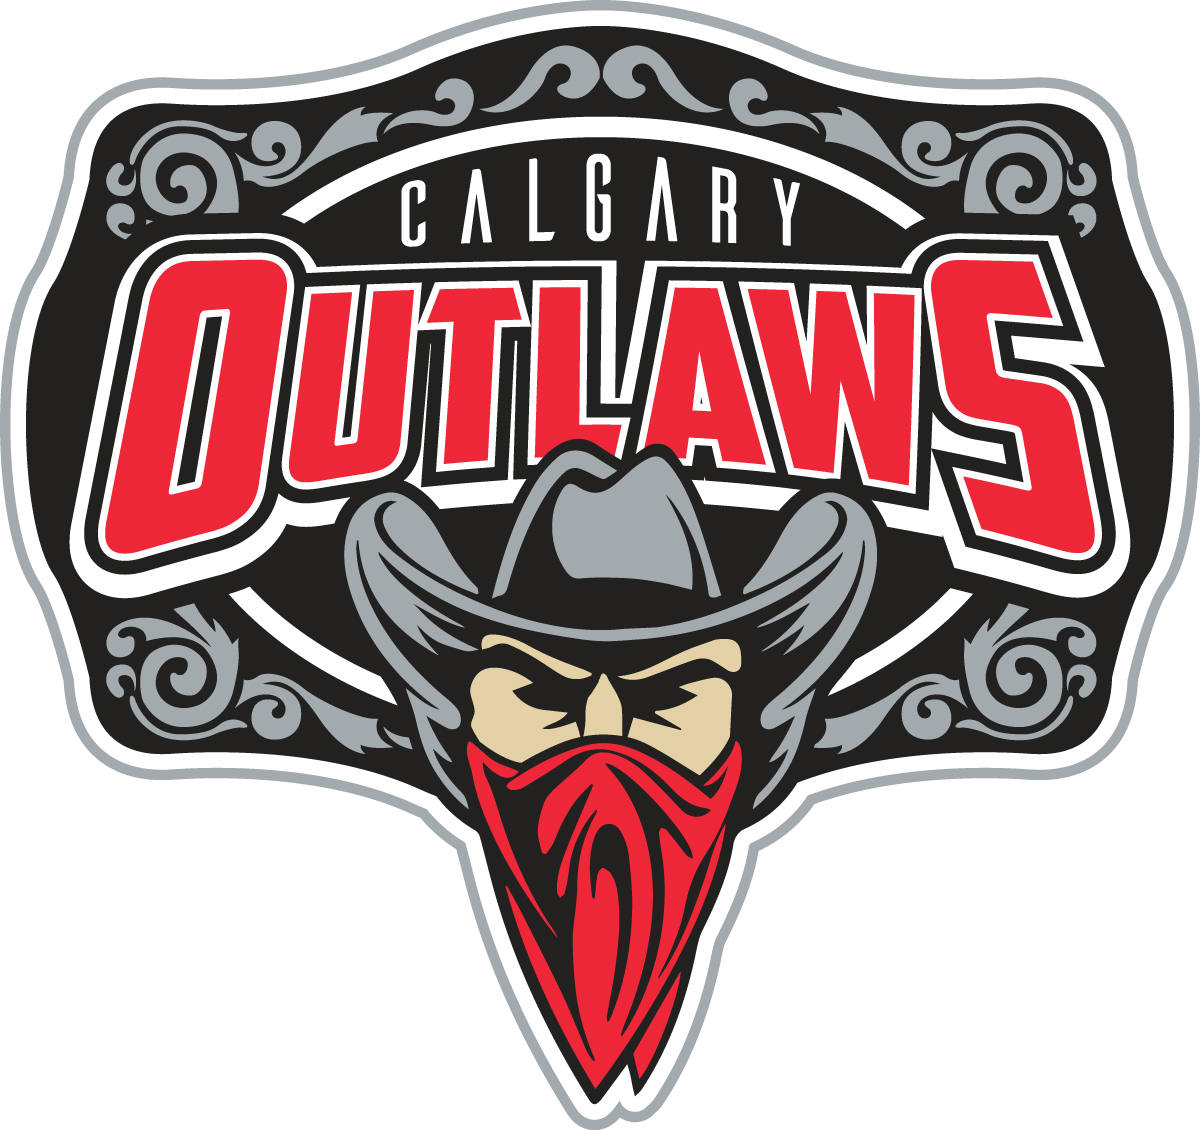 Calgary-Outlaws_FINAL.jpg (488 KB)